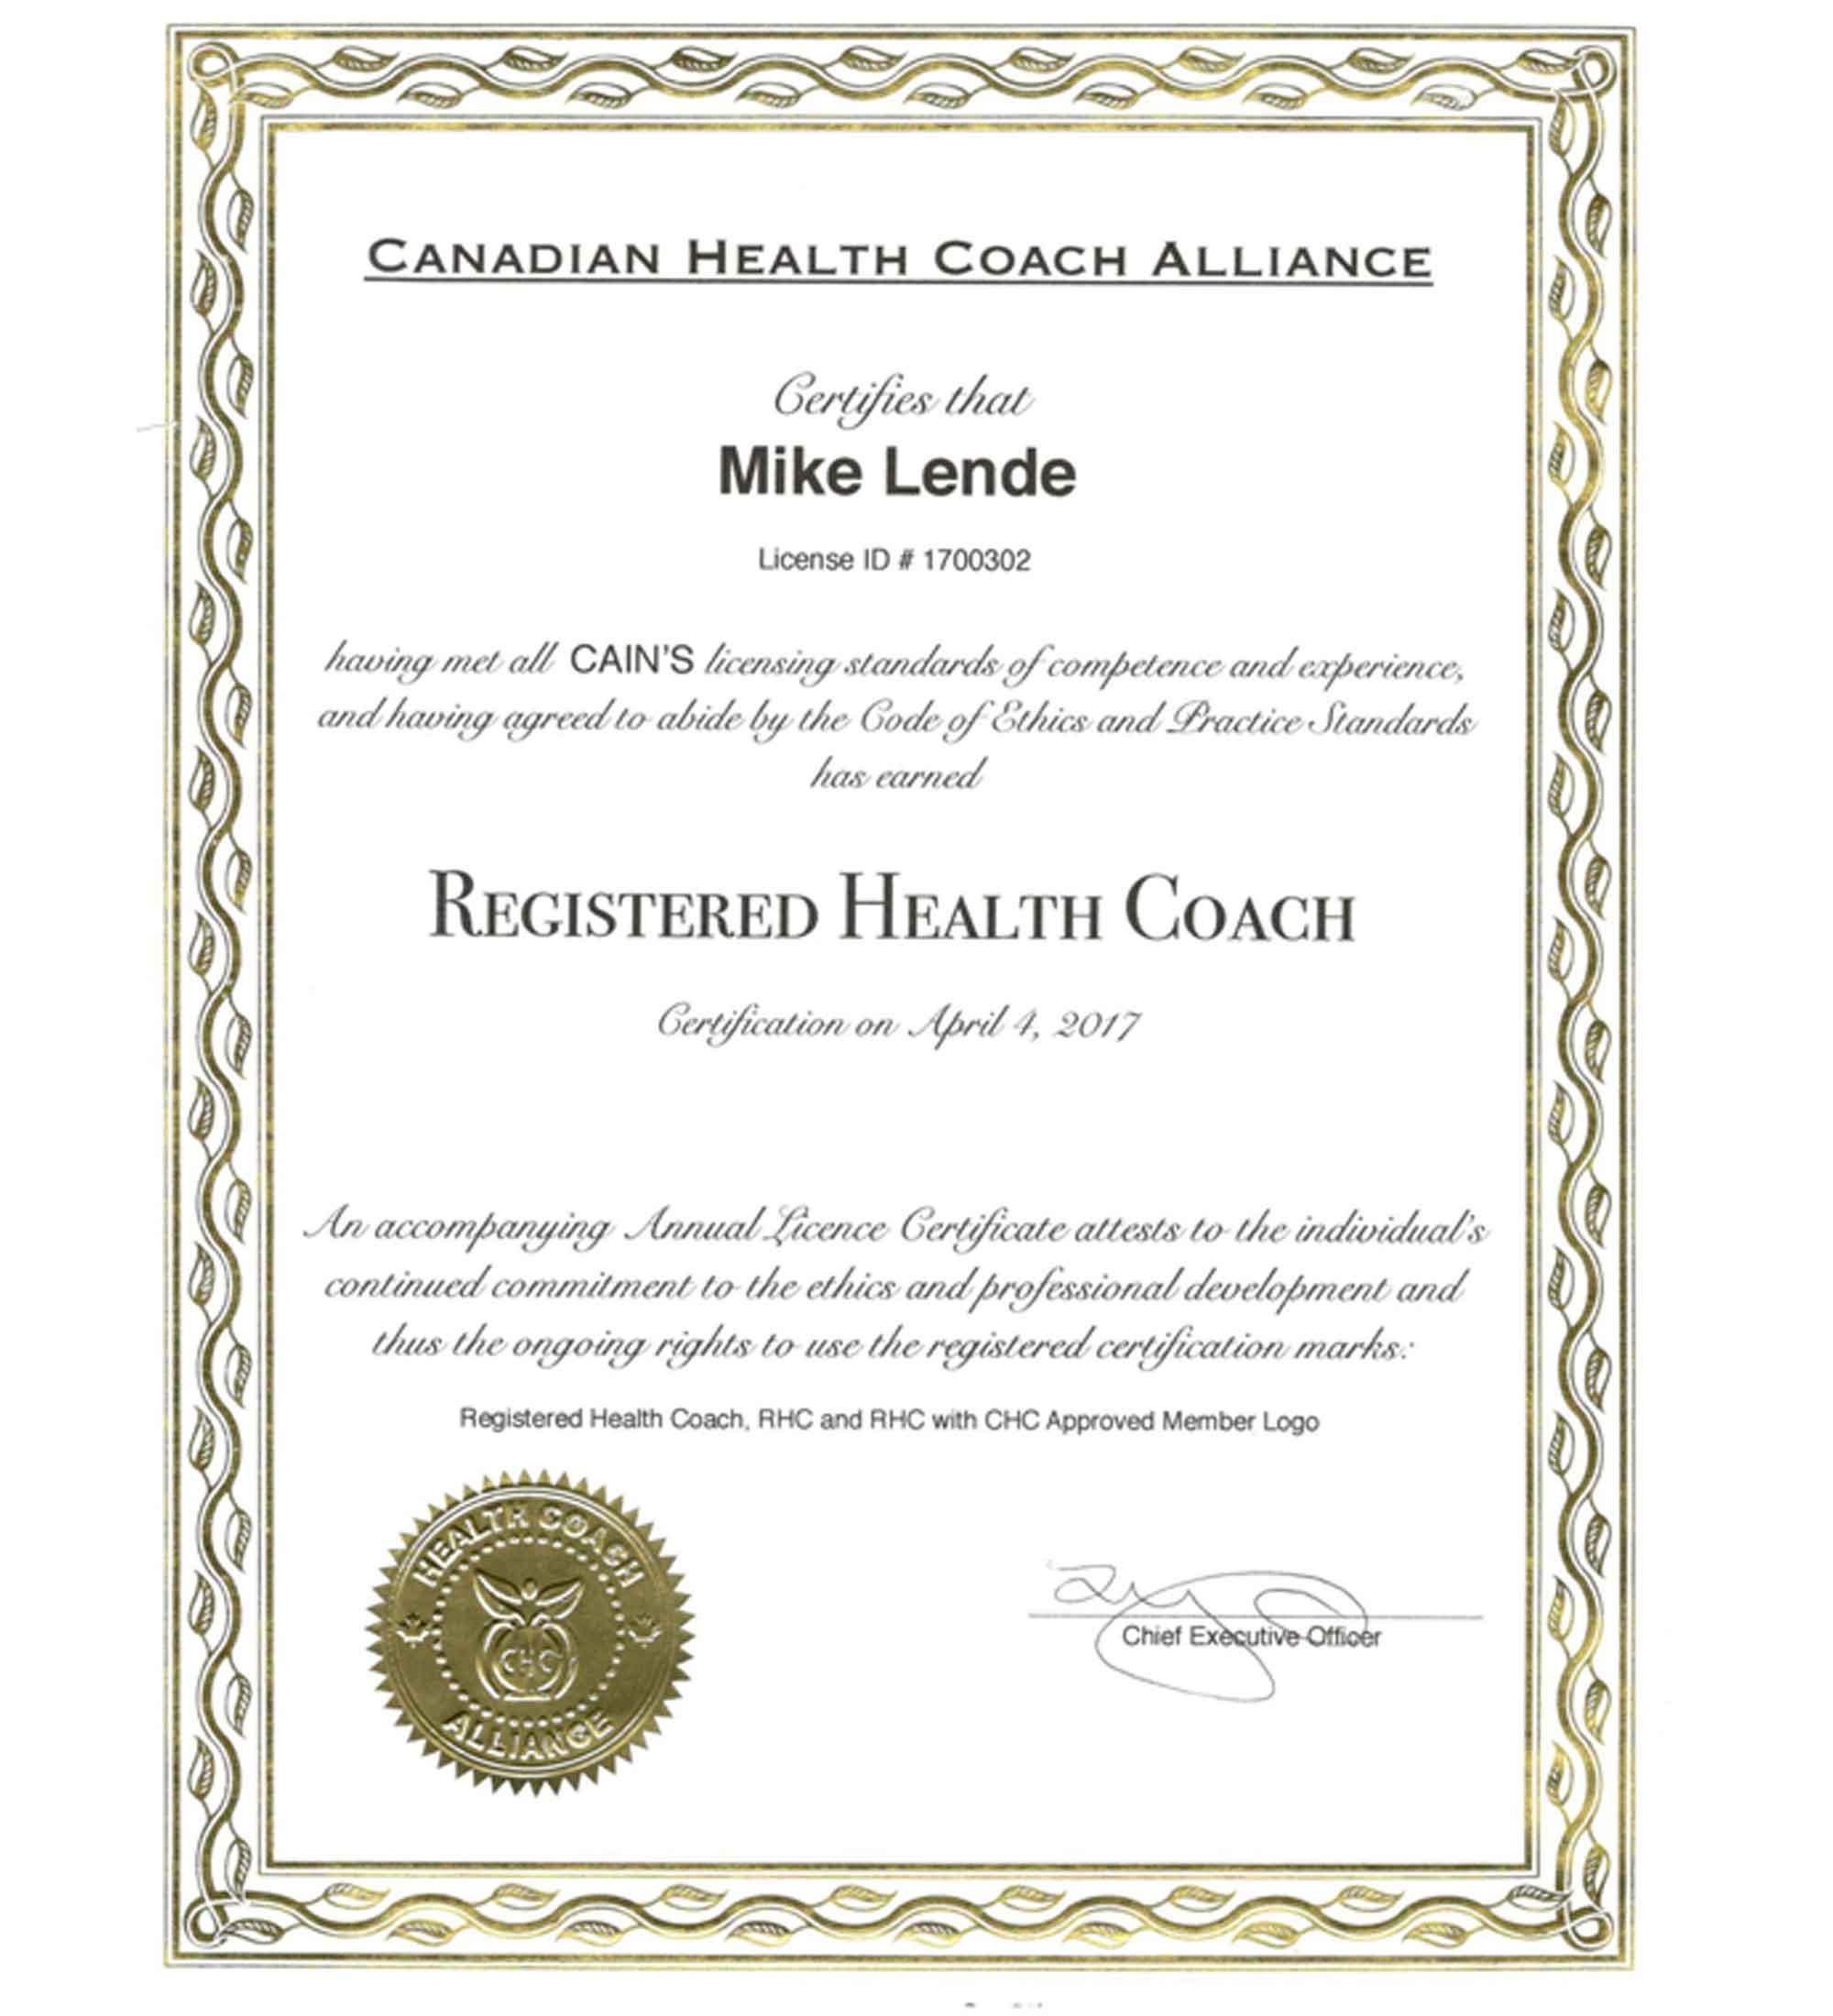 Mike Lende Health Coach Toronto Canada Men Sports Nutritionist